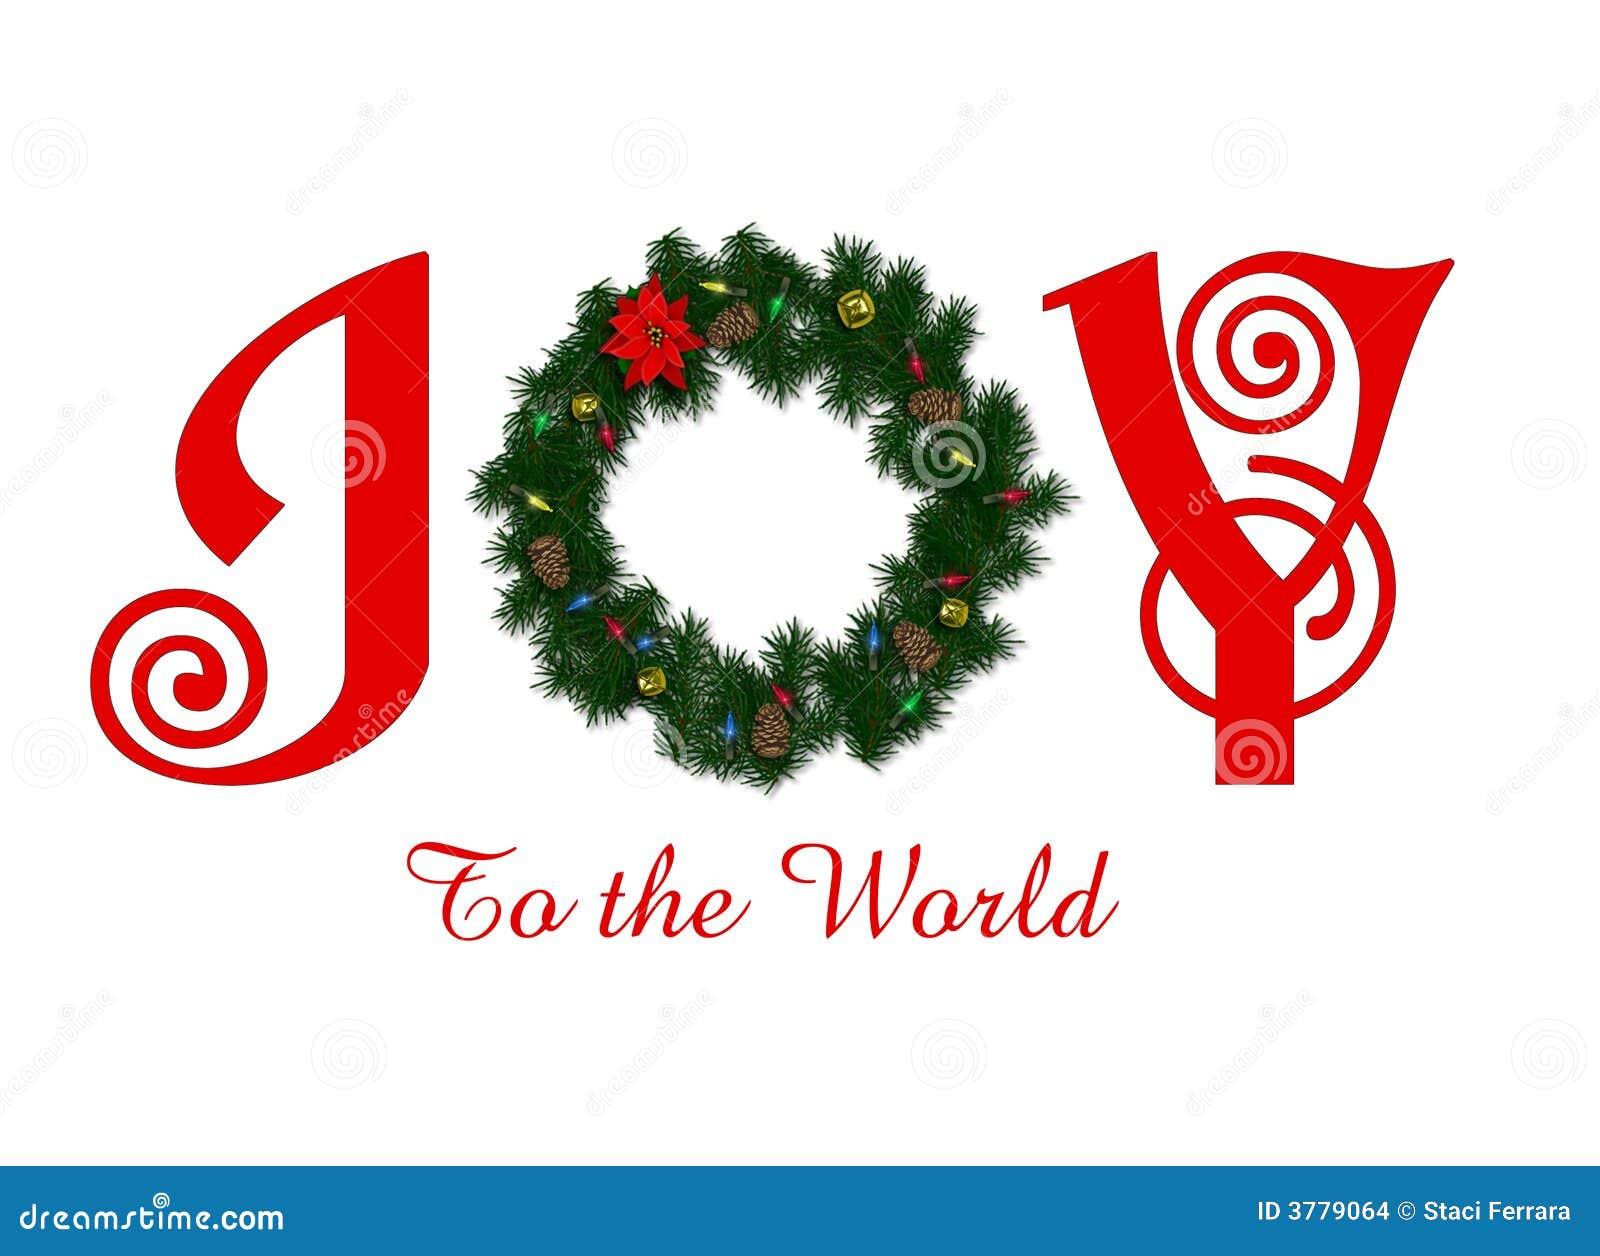 Joy to the World stock illustration. Illustration of peace - 3779064